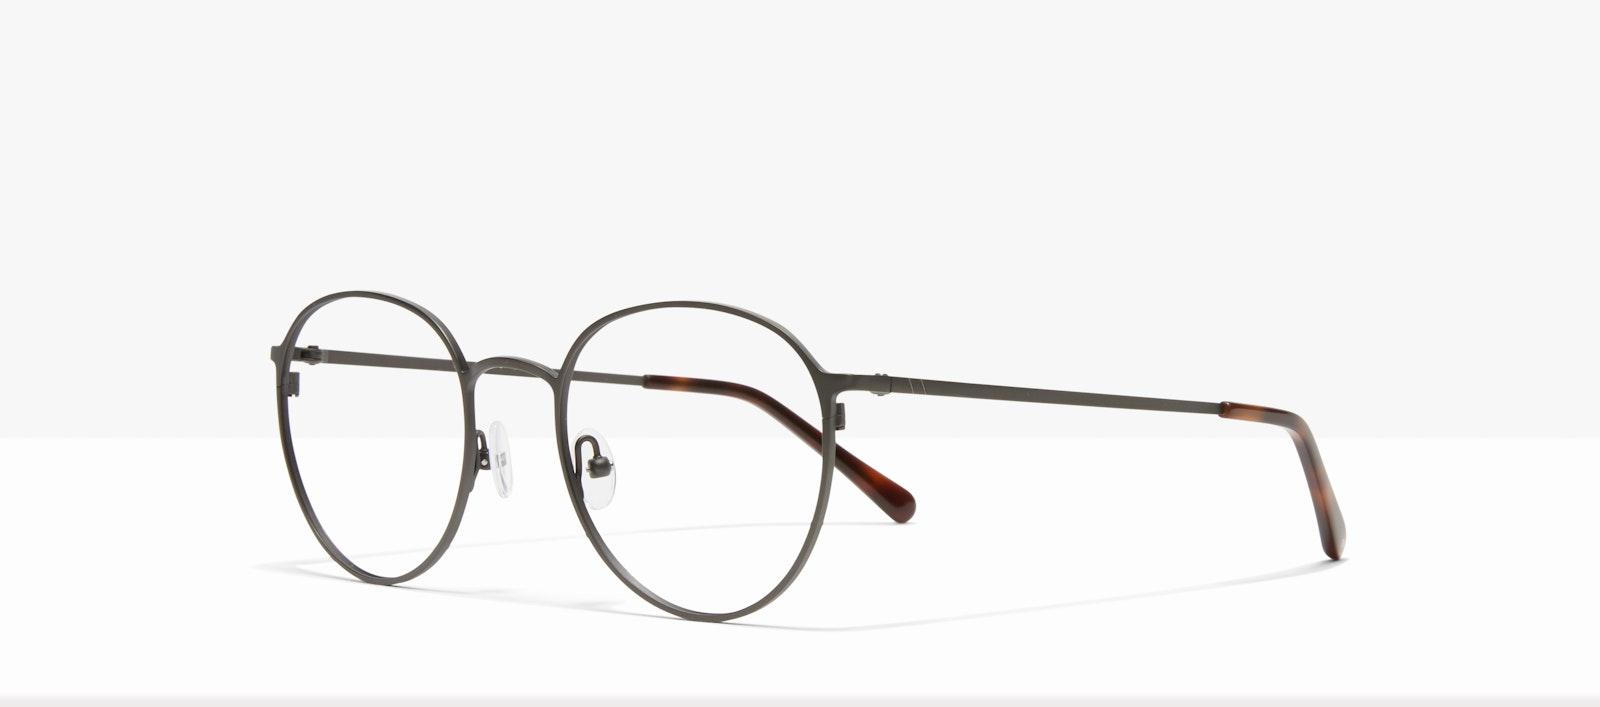 Affordable Fashion Glasses Round Eyeglasses Men Ridge Carbon Tilt